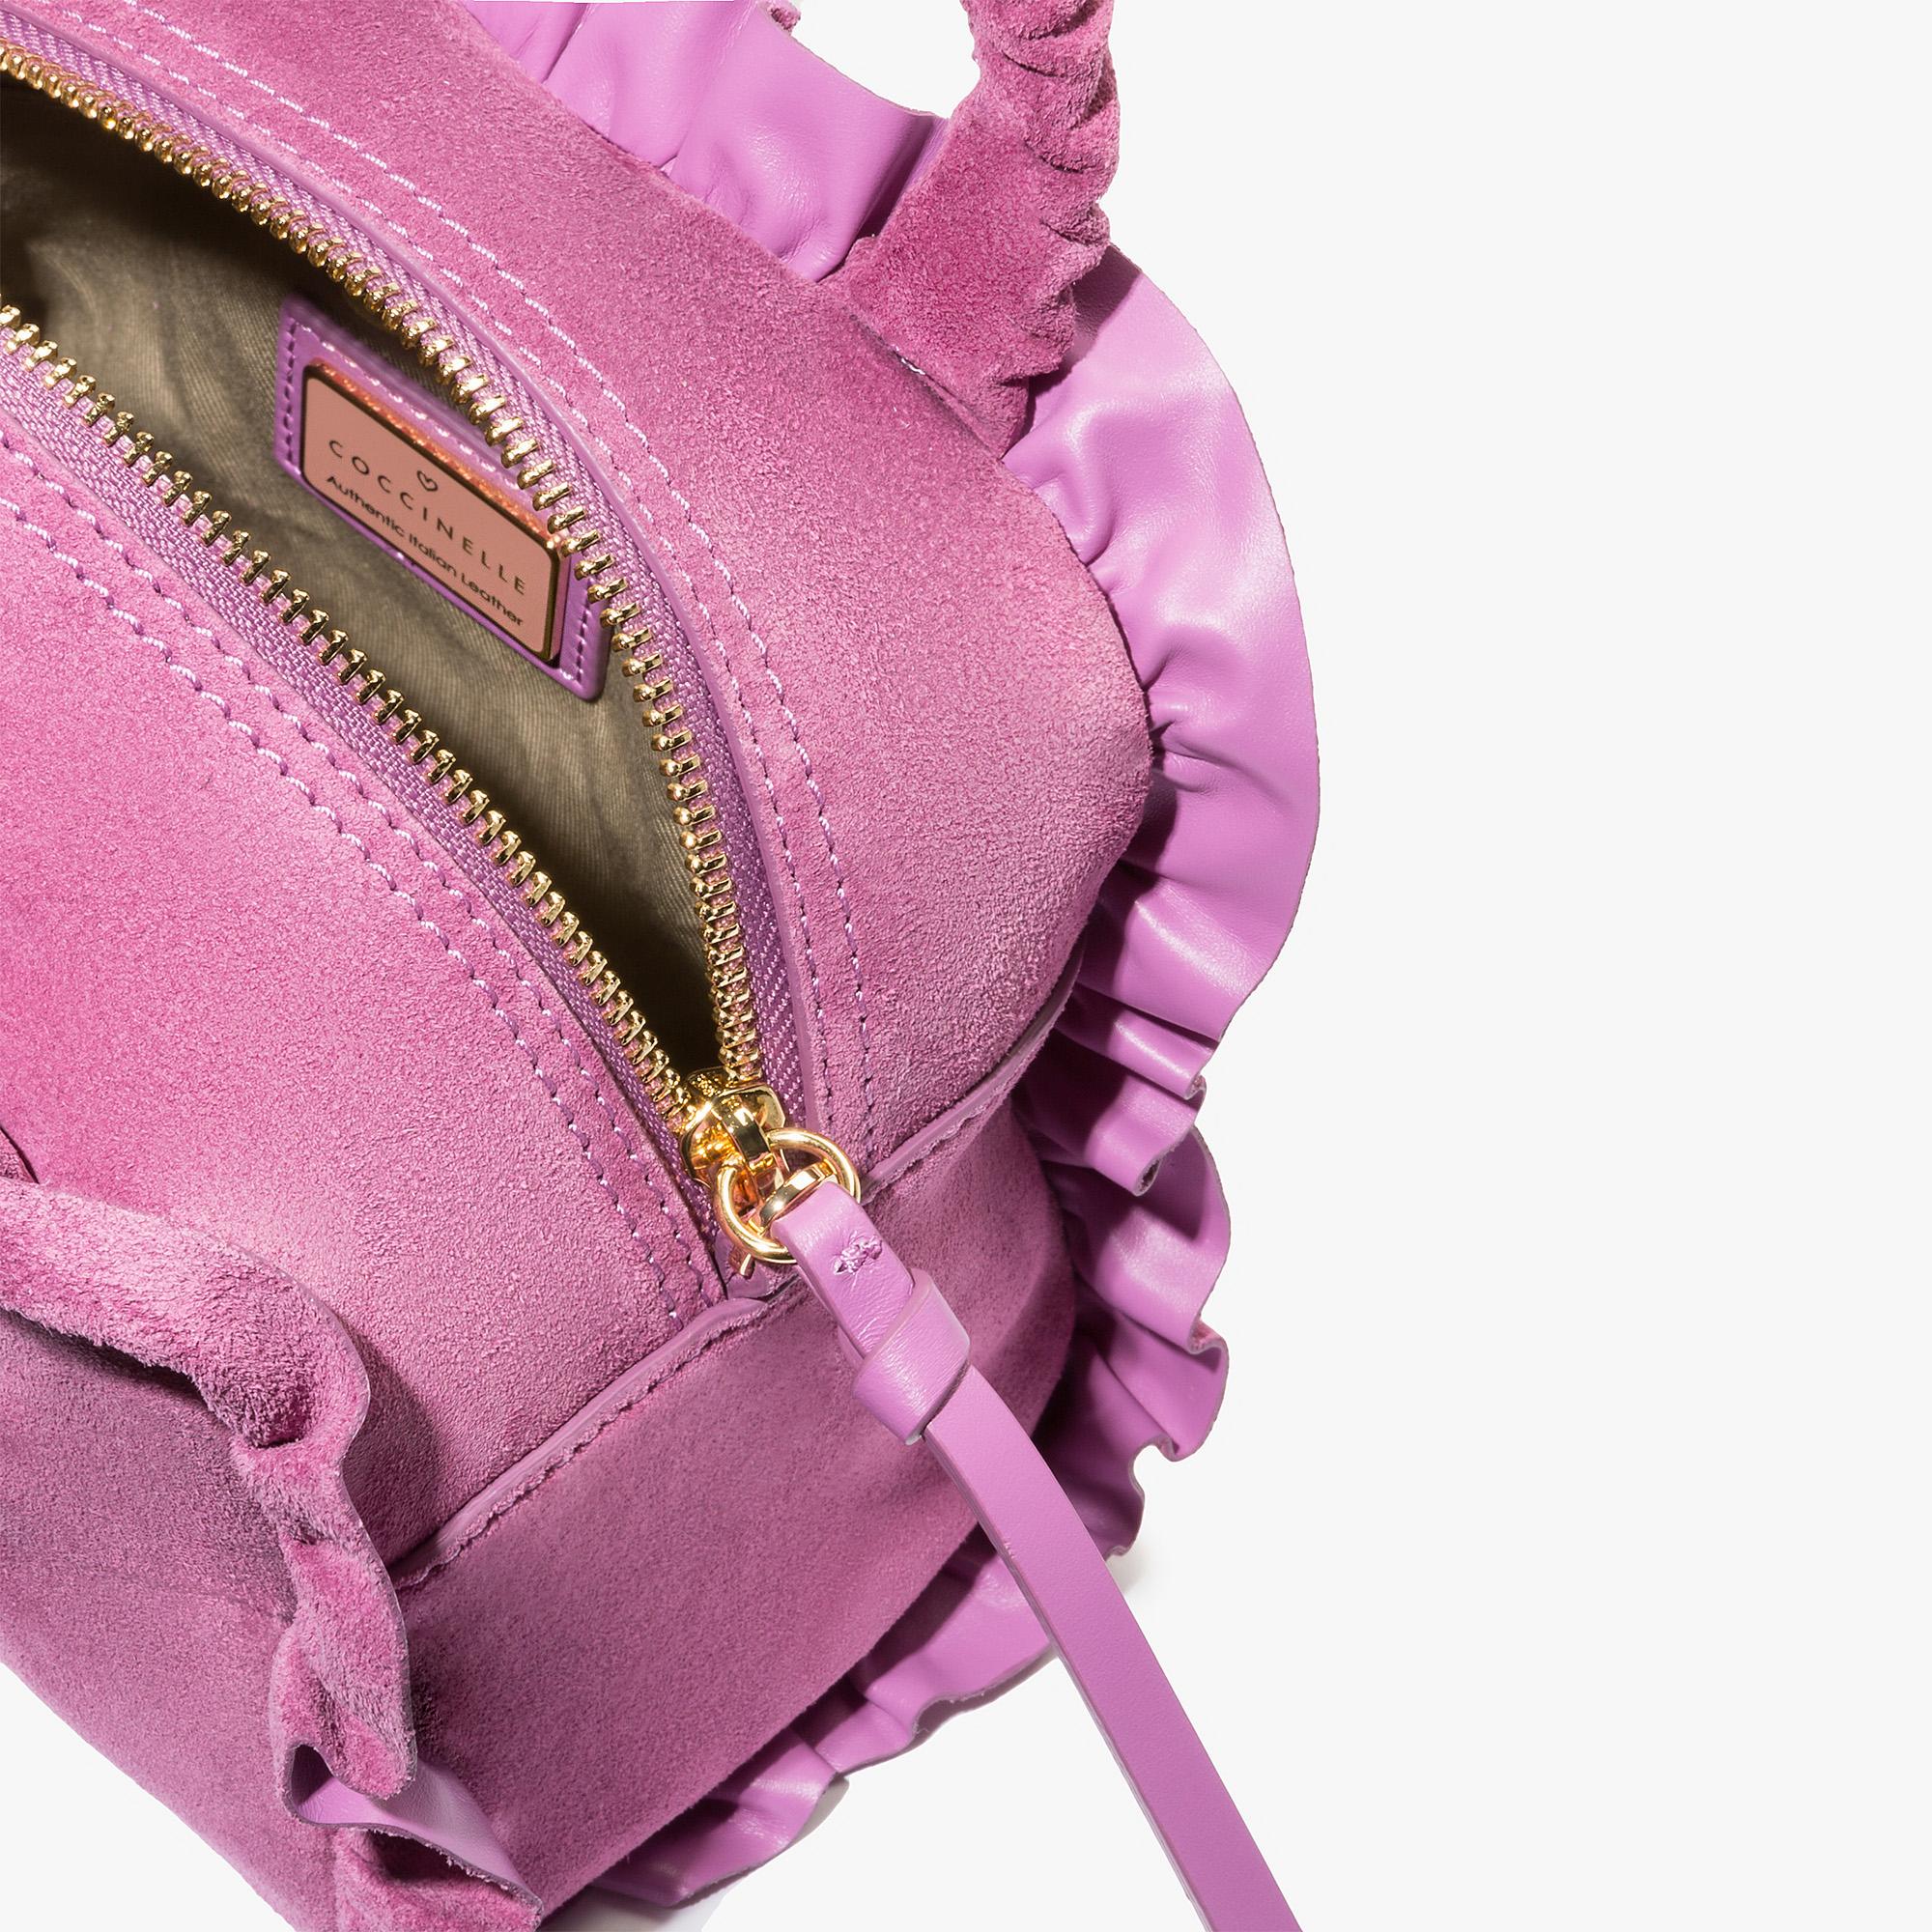 Coccinelle Brune suede minibag